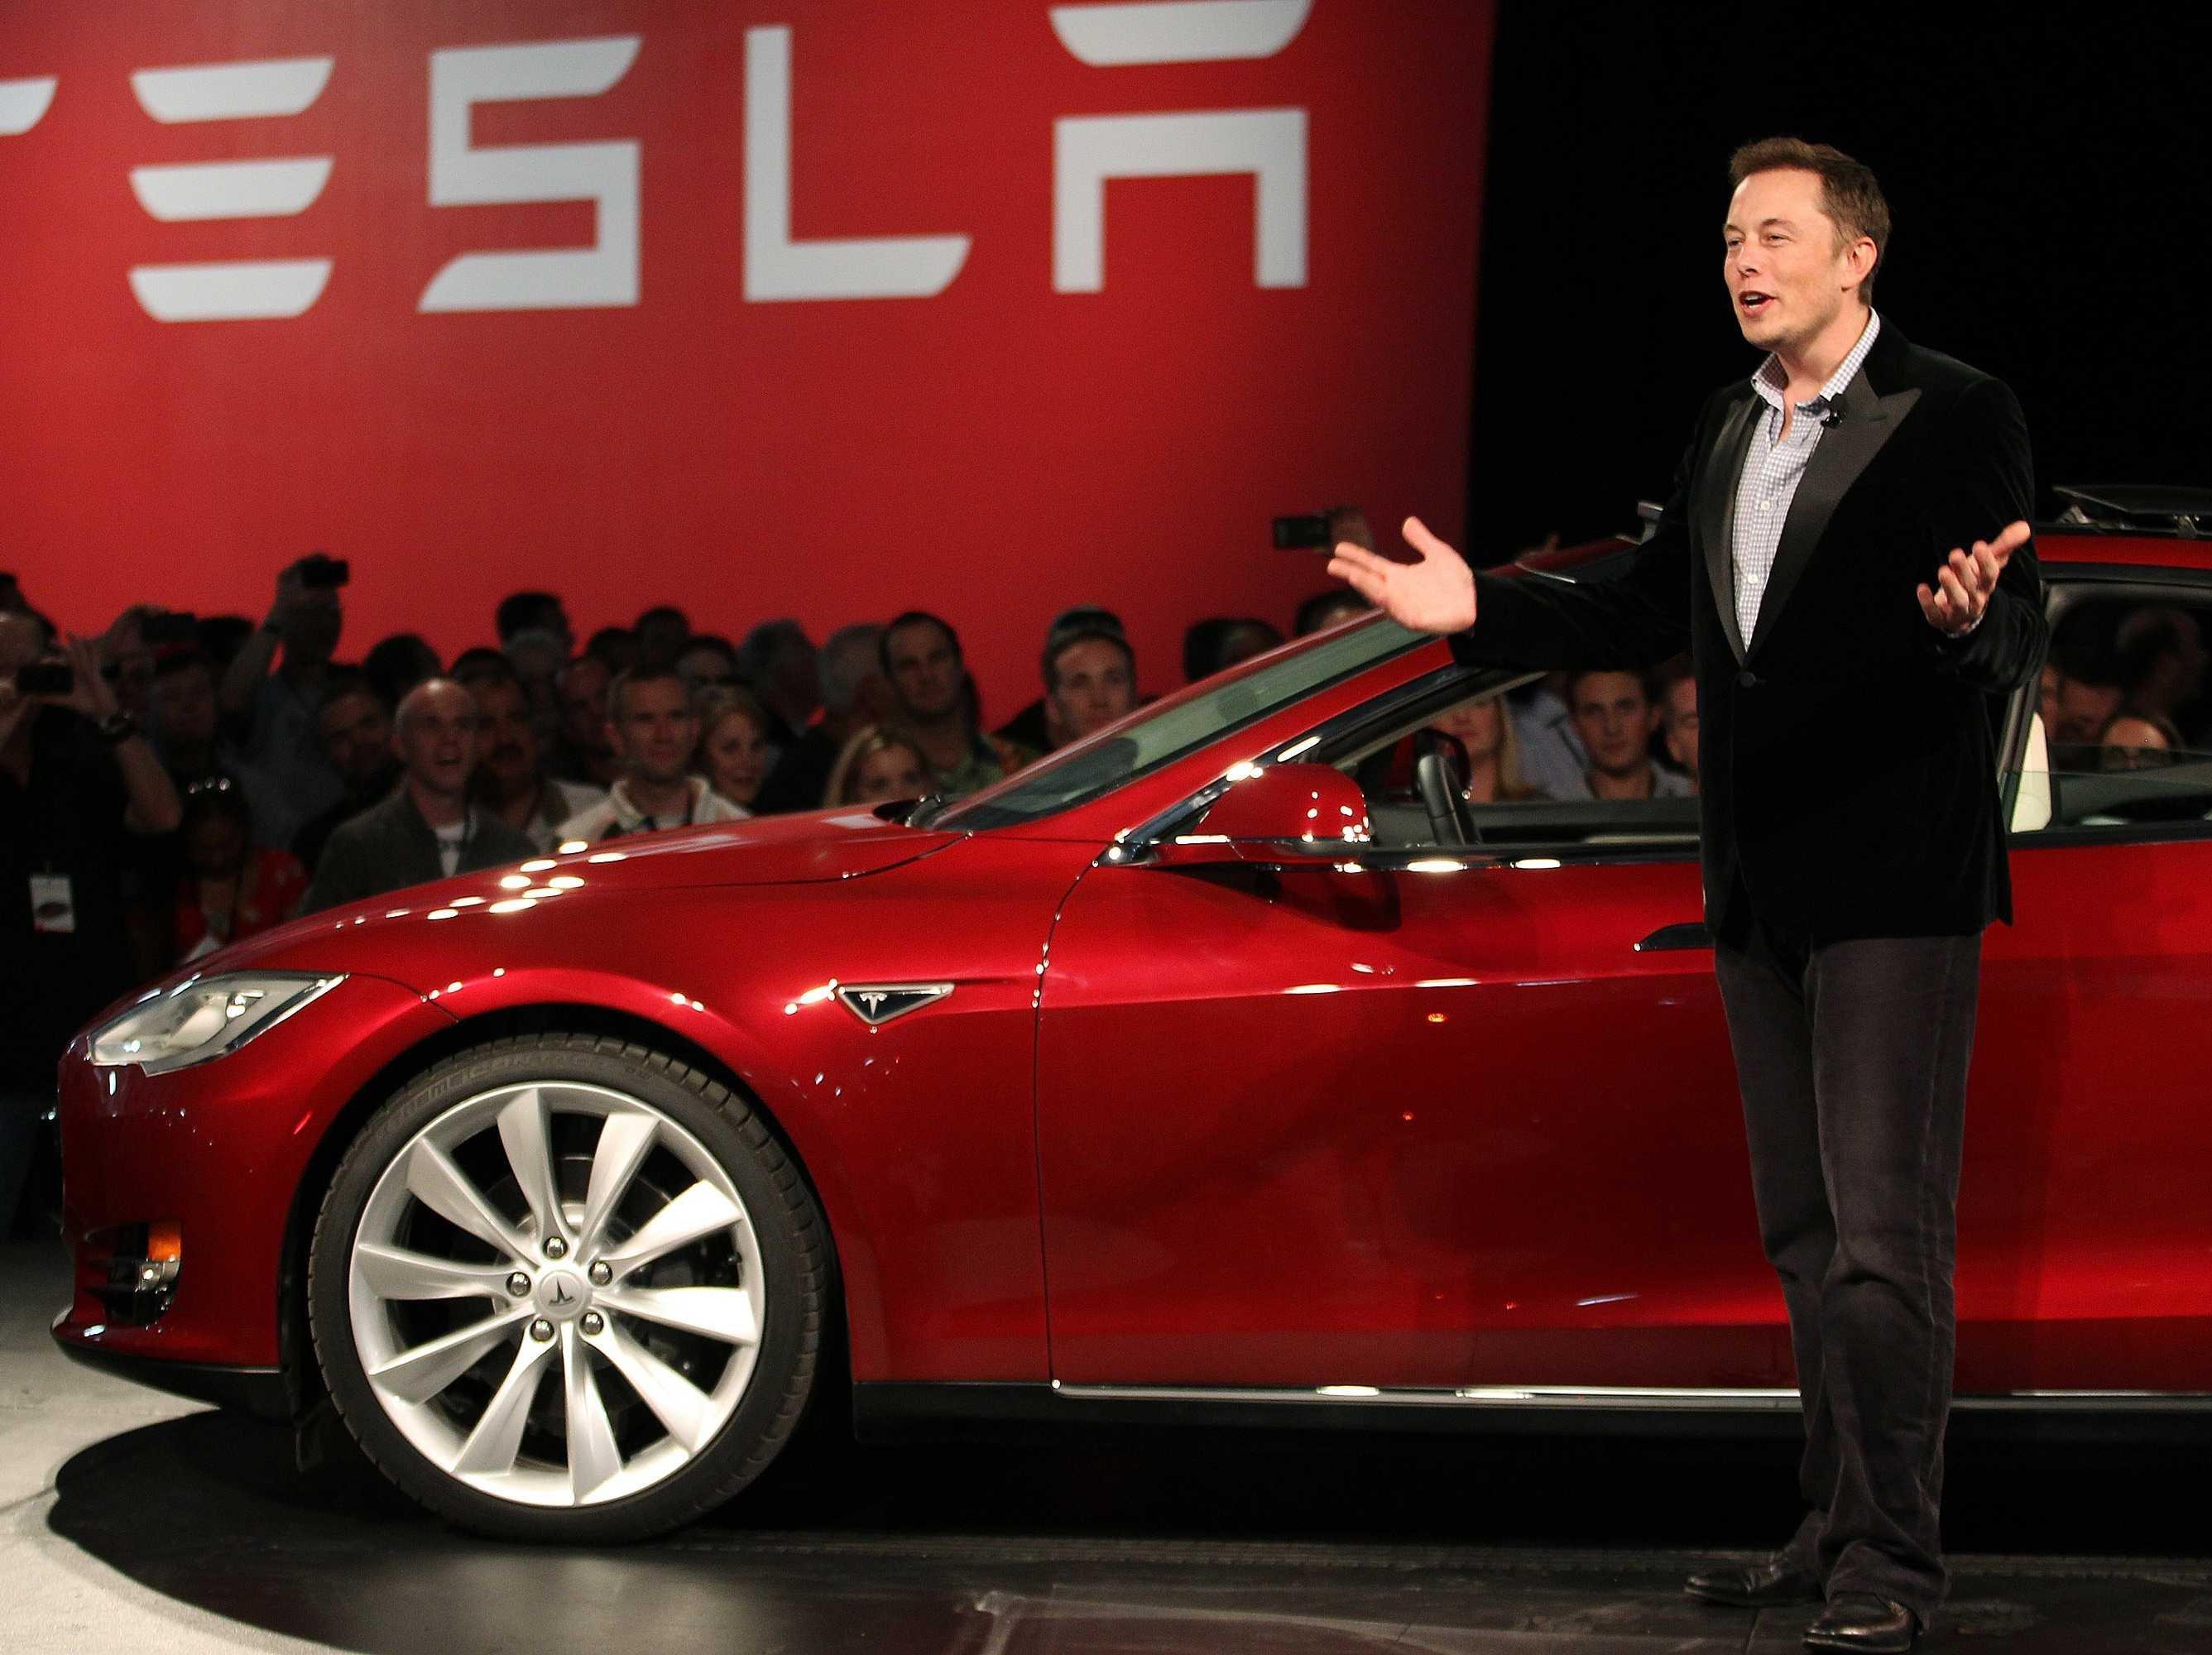 Elon Musk terzo uomo più ricco del Mondo con Tesla da S&P 500